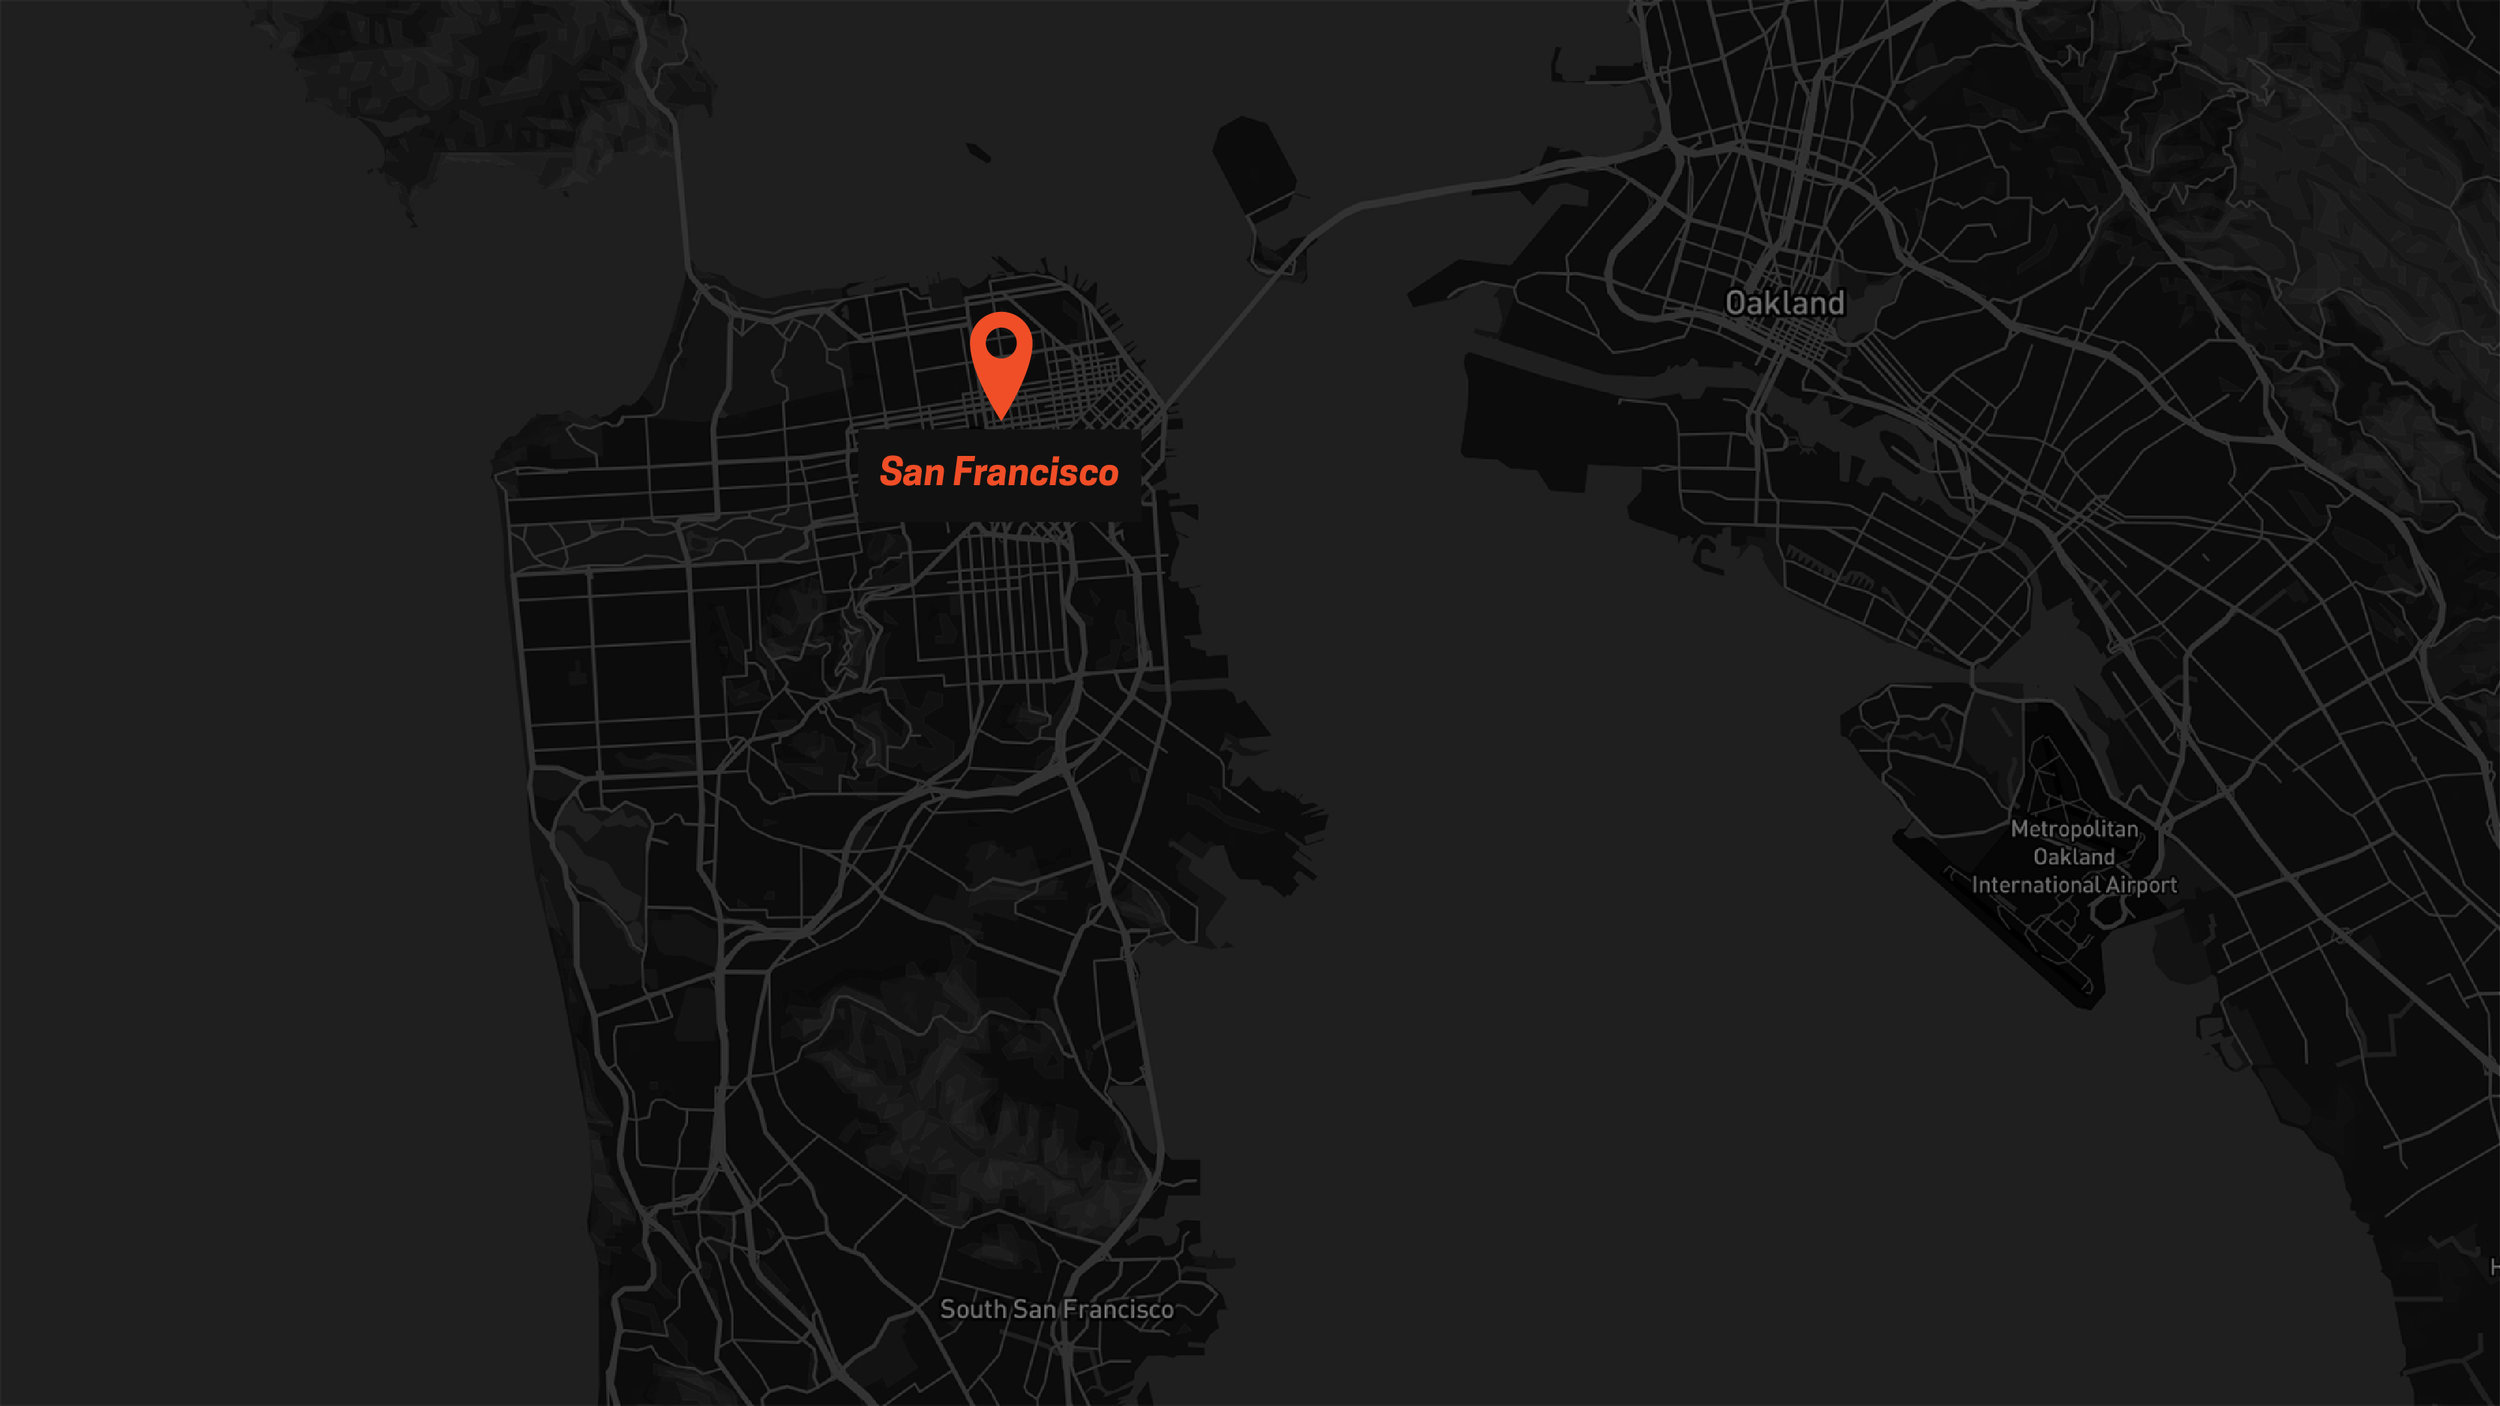 _Aug 24_CMH Analogy map-01.jpg